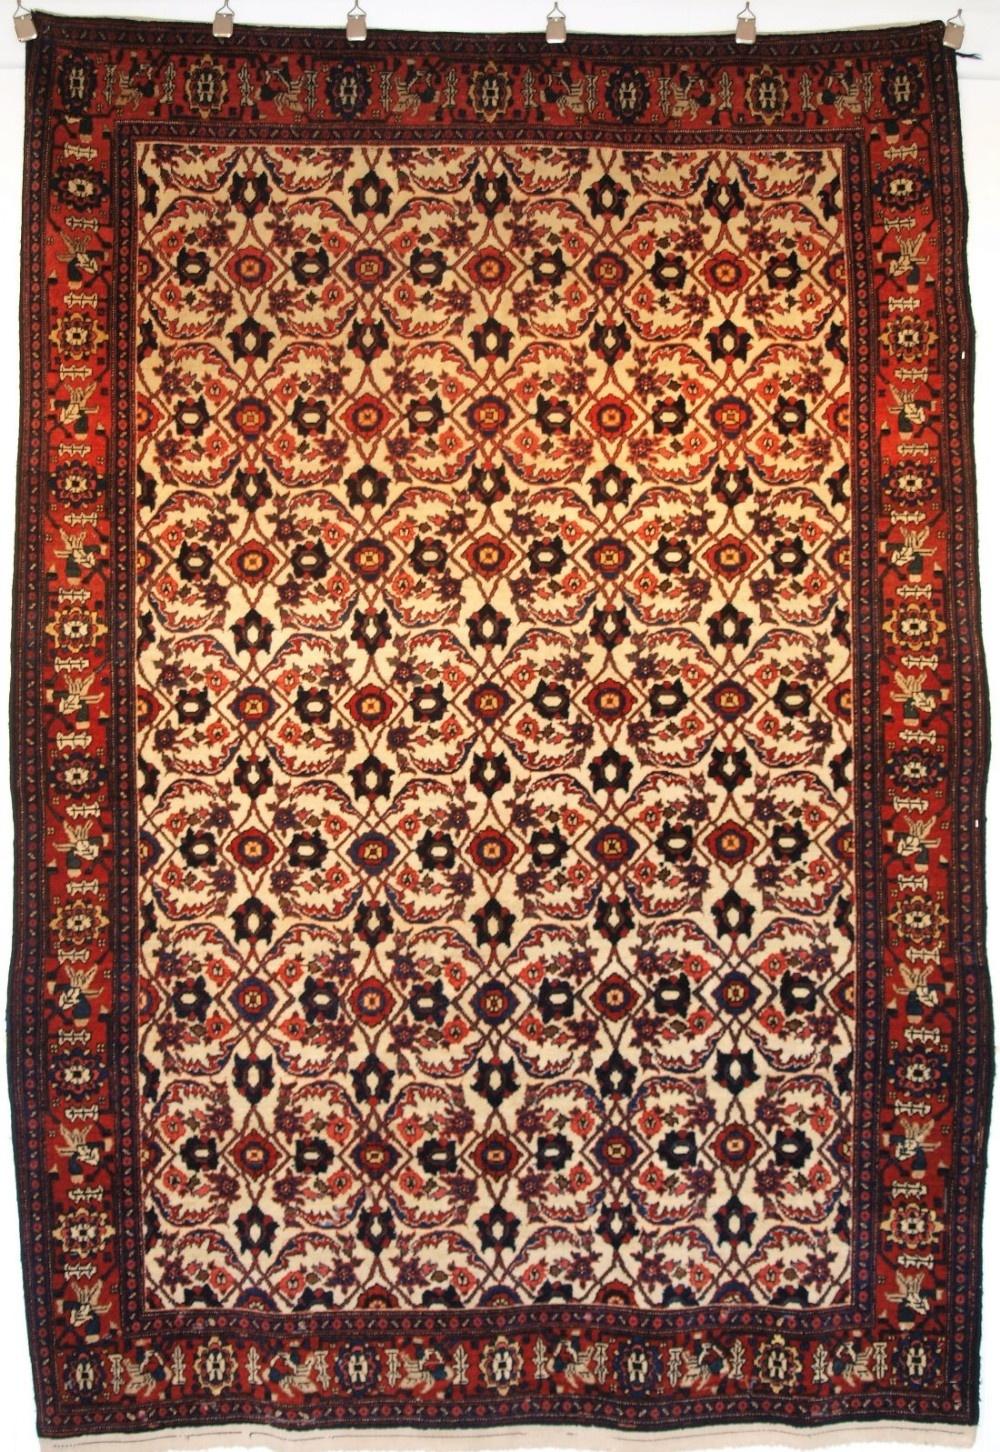 antique senneh rug ivory ground with herati design full pile circa 1900